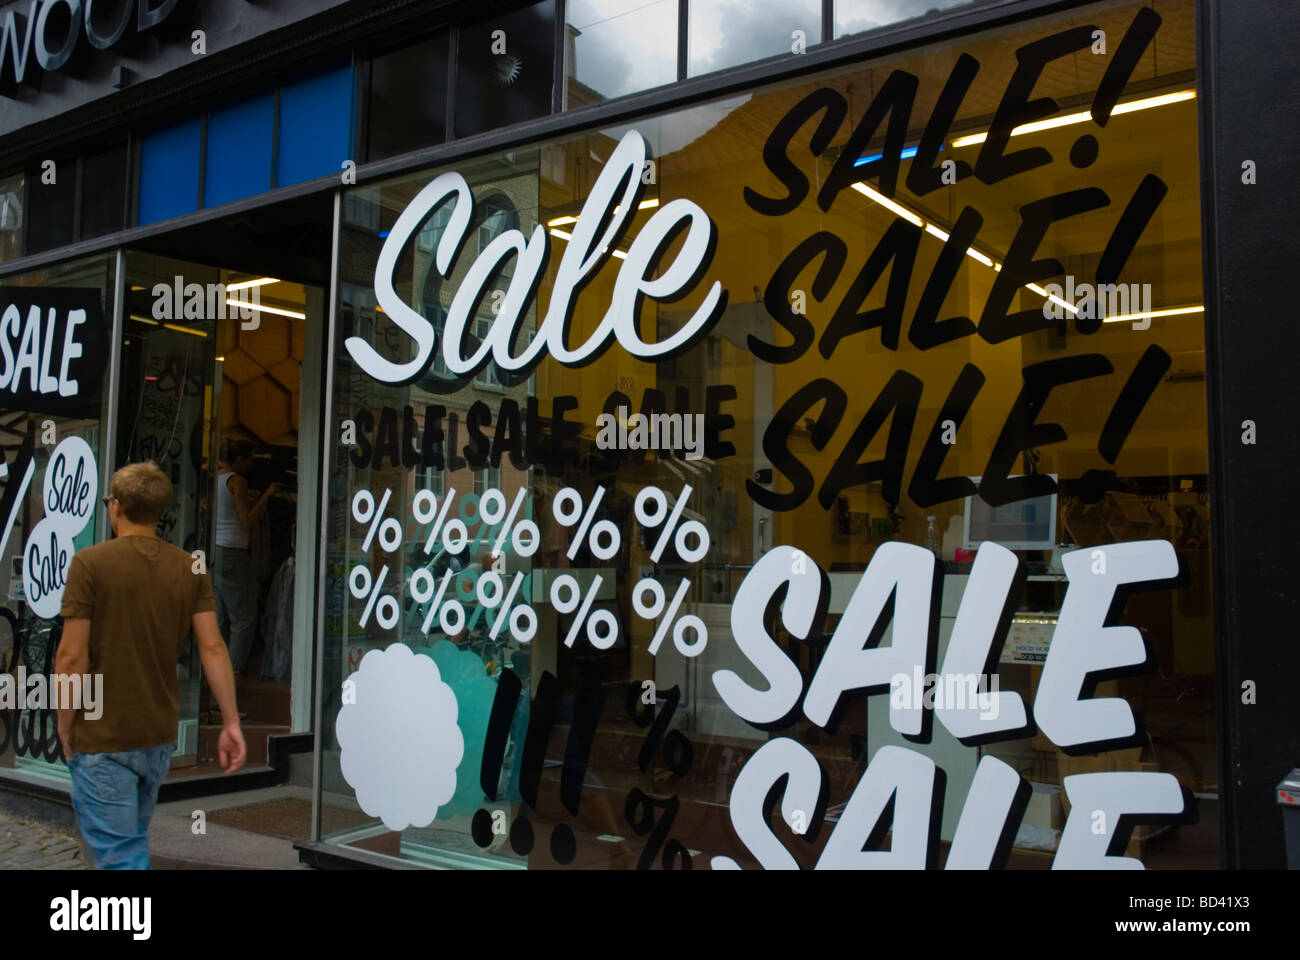 On Sale signs in a shop window in central Copenhagen Denmark Europe - Stock Image